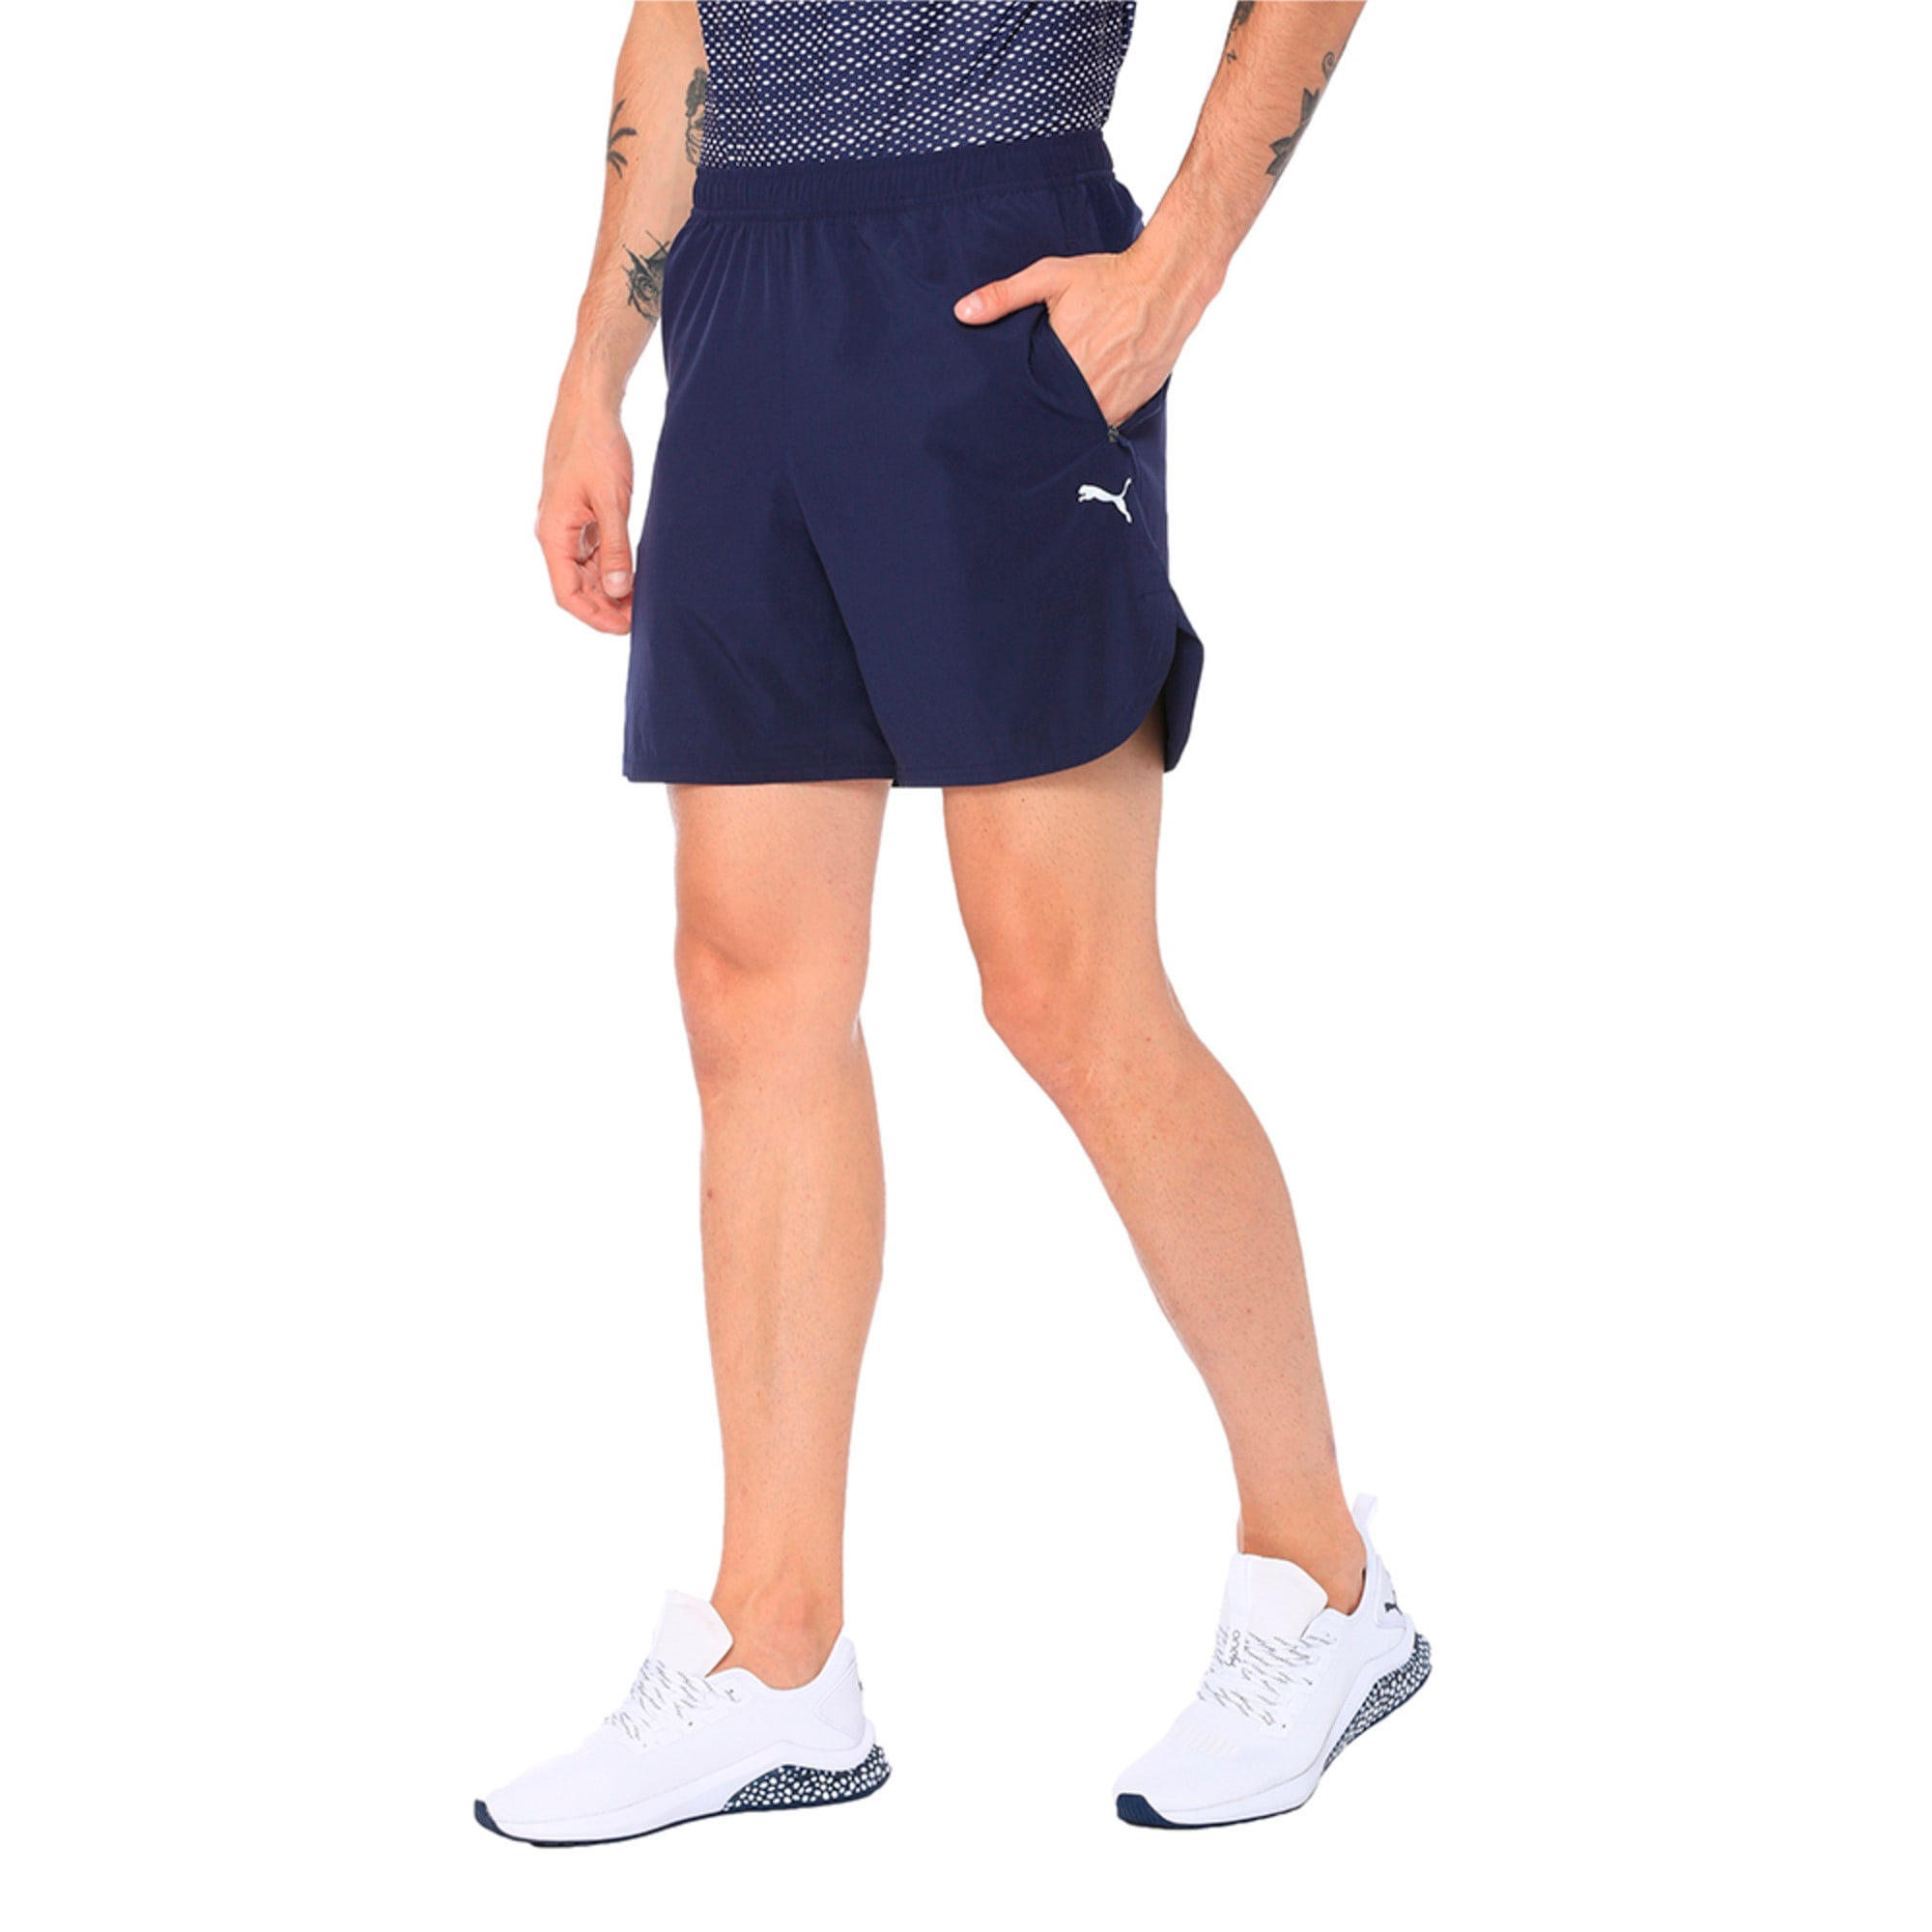 Thumbnail 3 of one8 VK Men's Active Shorts, Peacoat, medium-IND